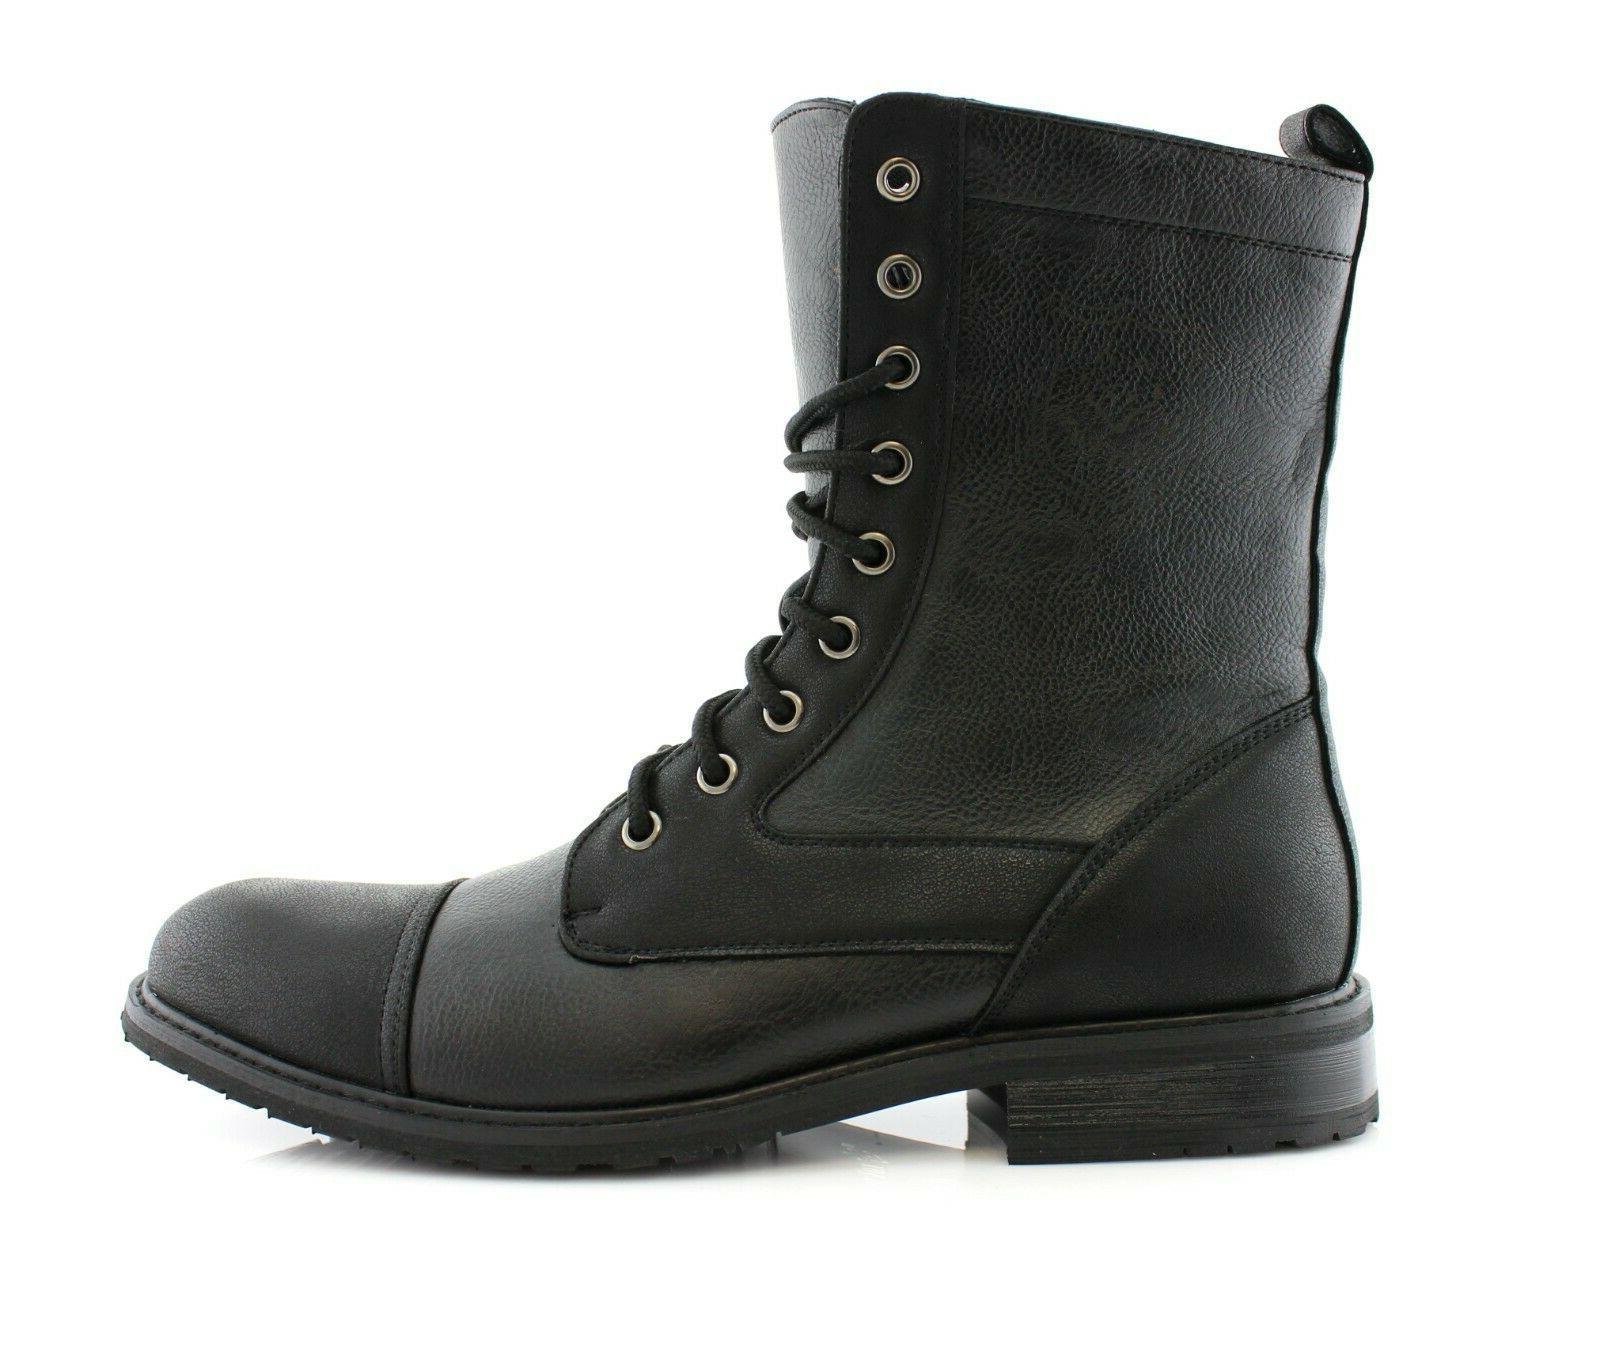 Men's Leather Lace-up Black Ankle Dress Shoes